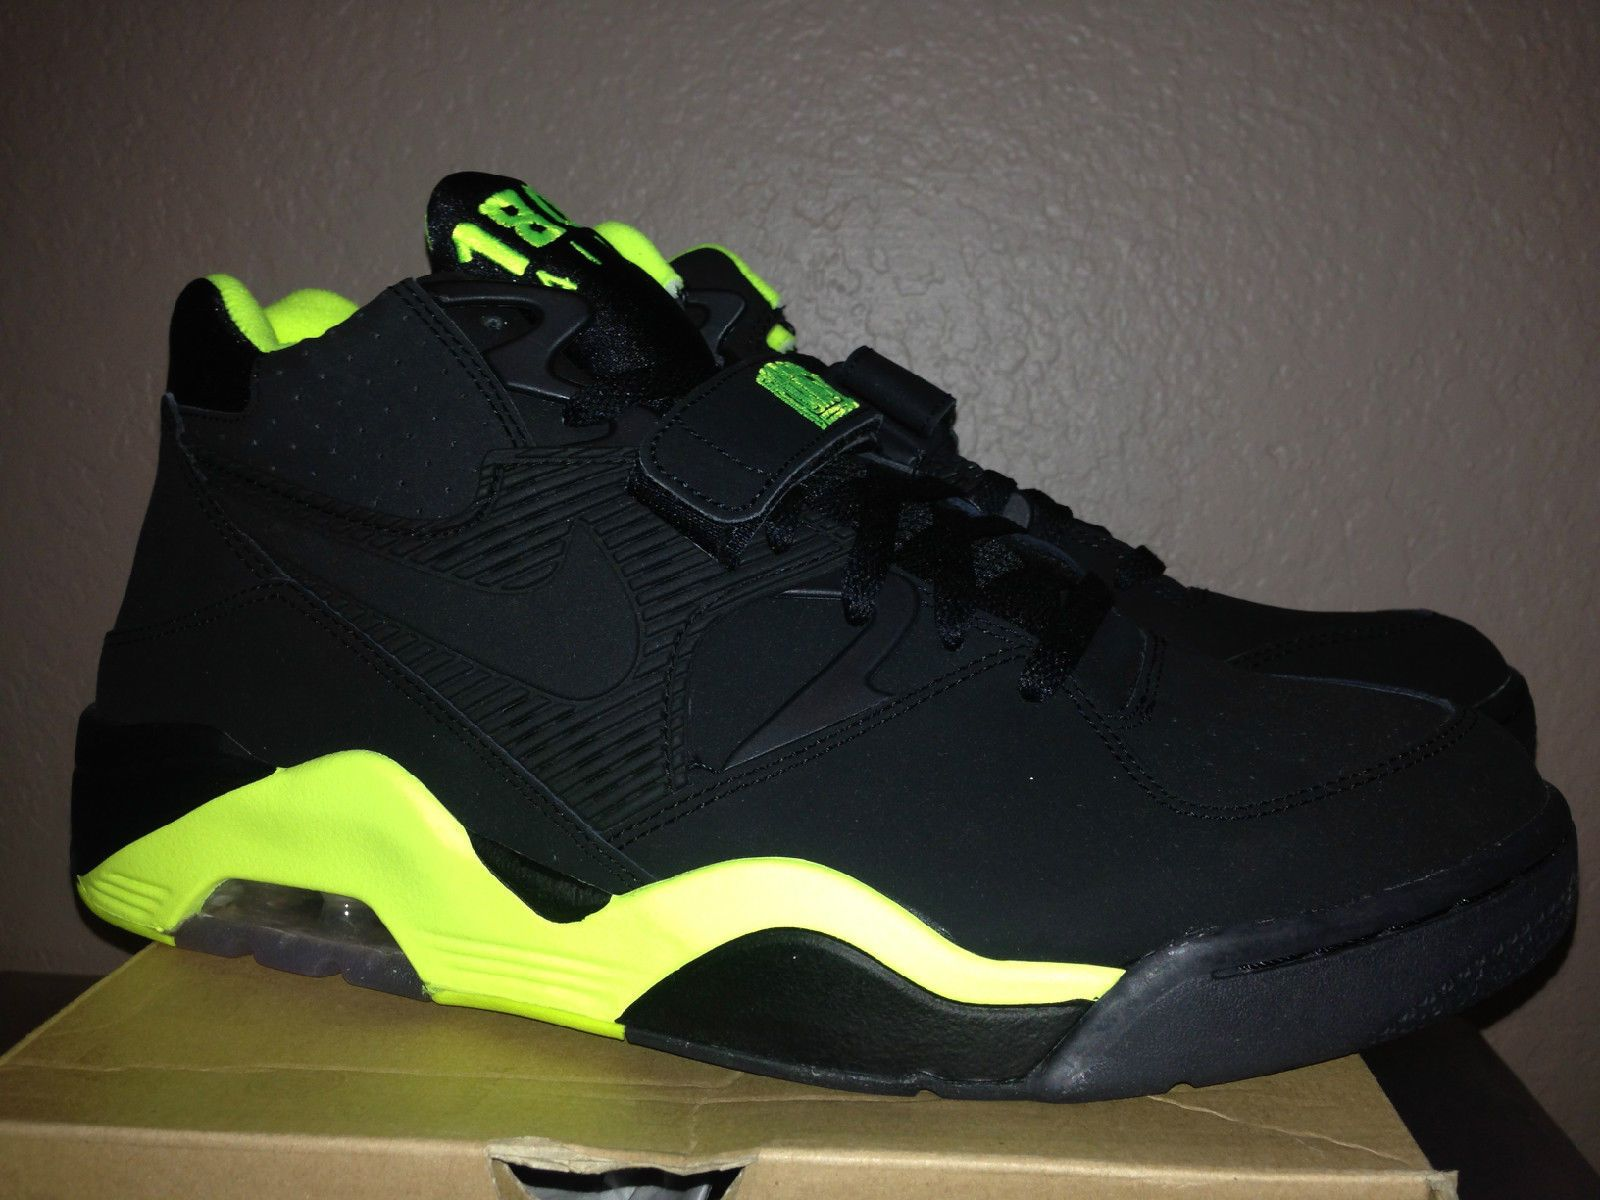 b3b7531714 Nike Air Force Max 180 Retro Barkley Black Volt Neon Posite Godzilla 310095  012